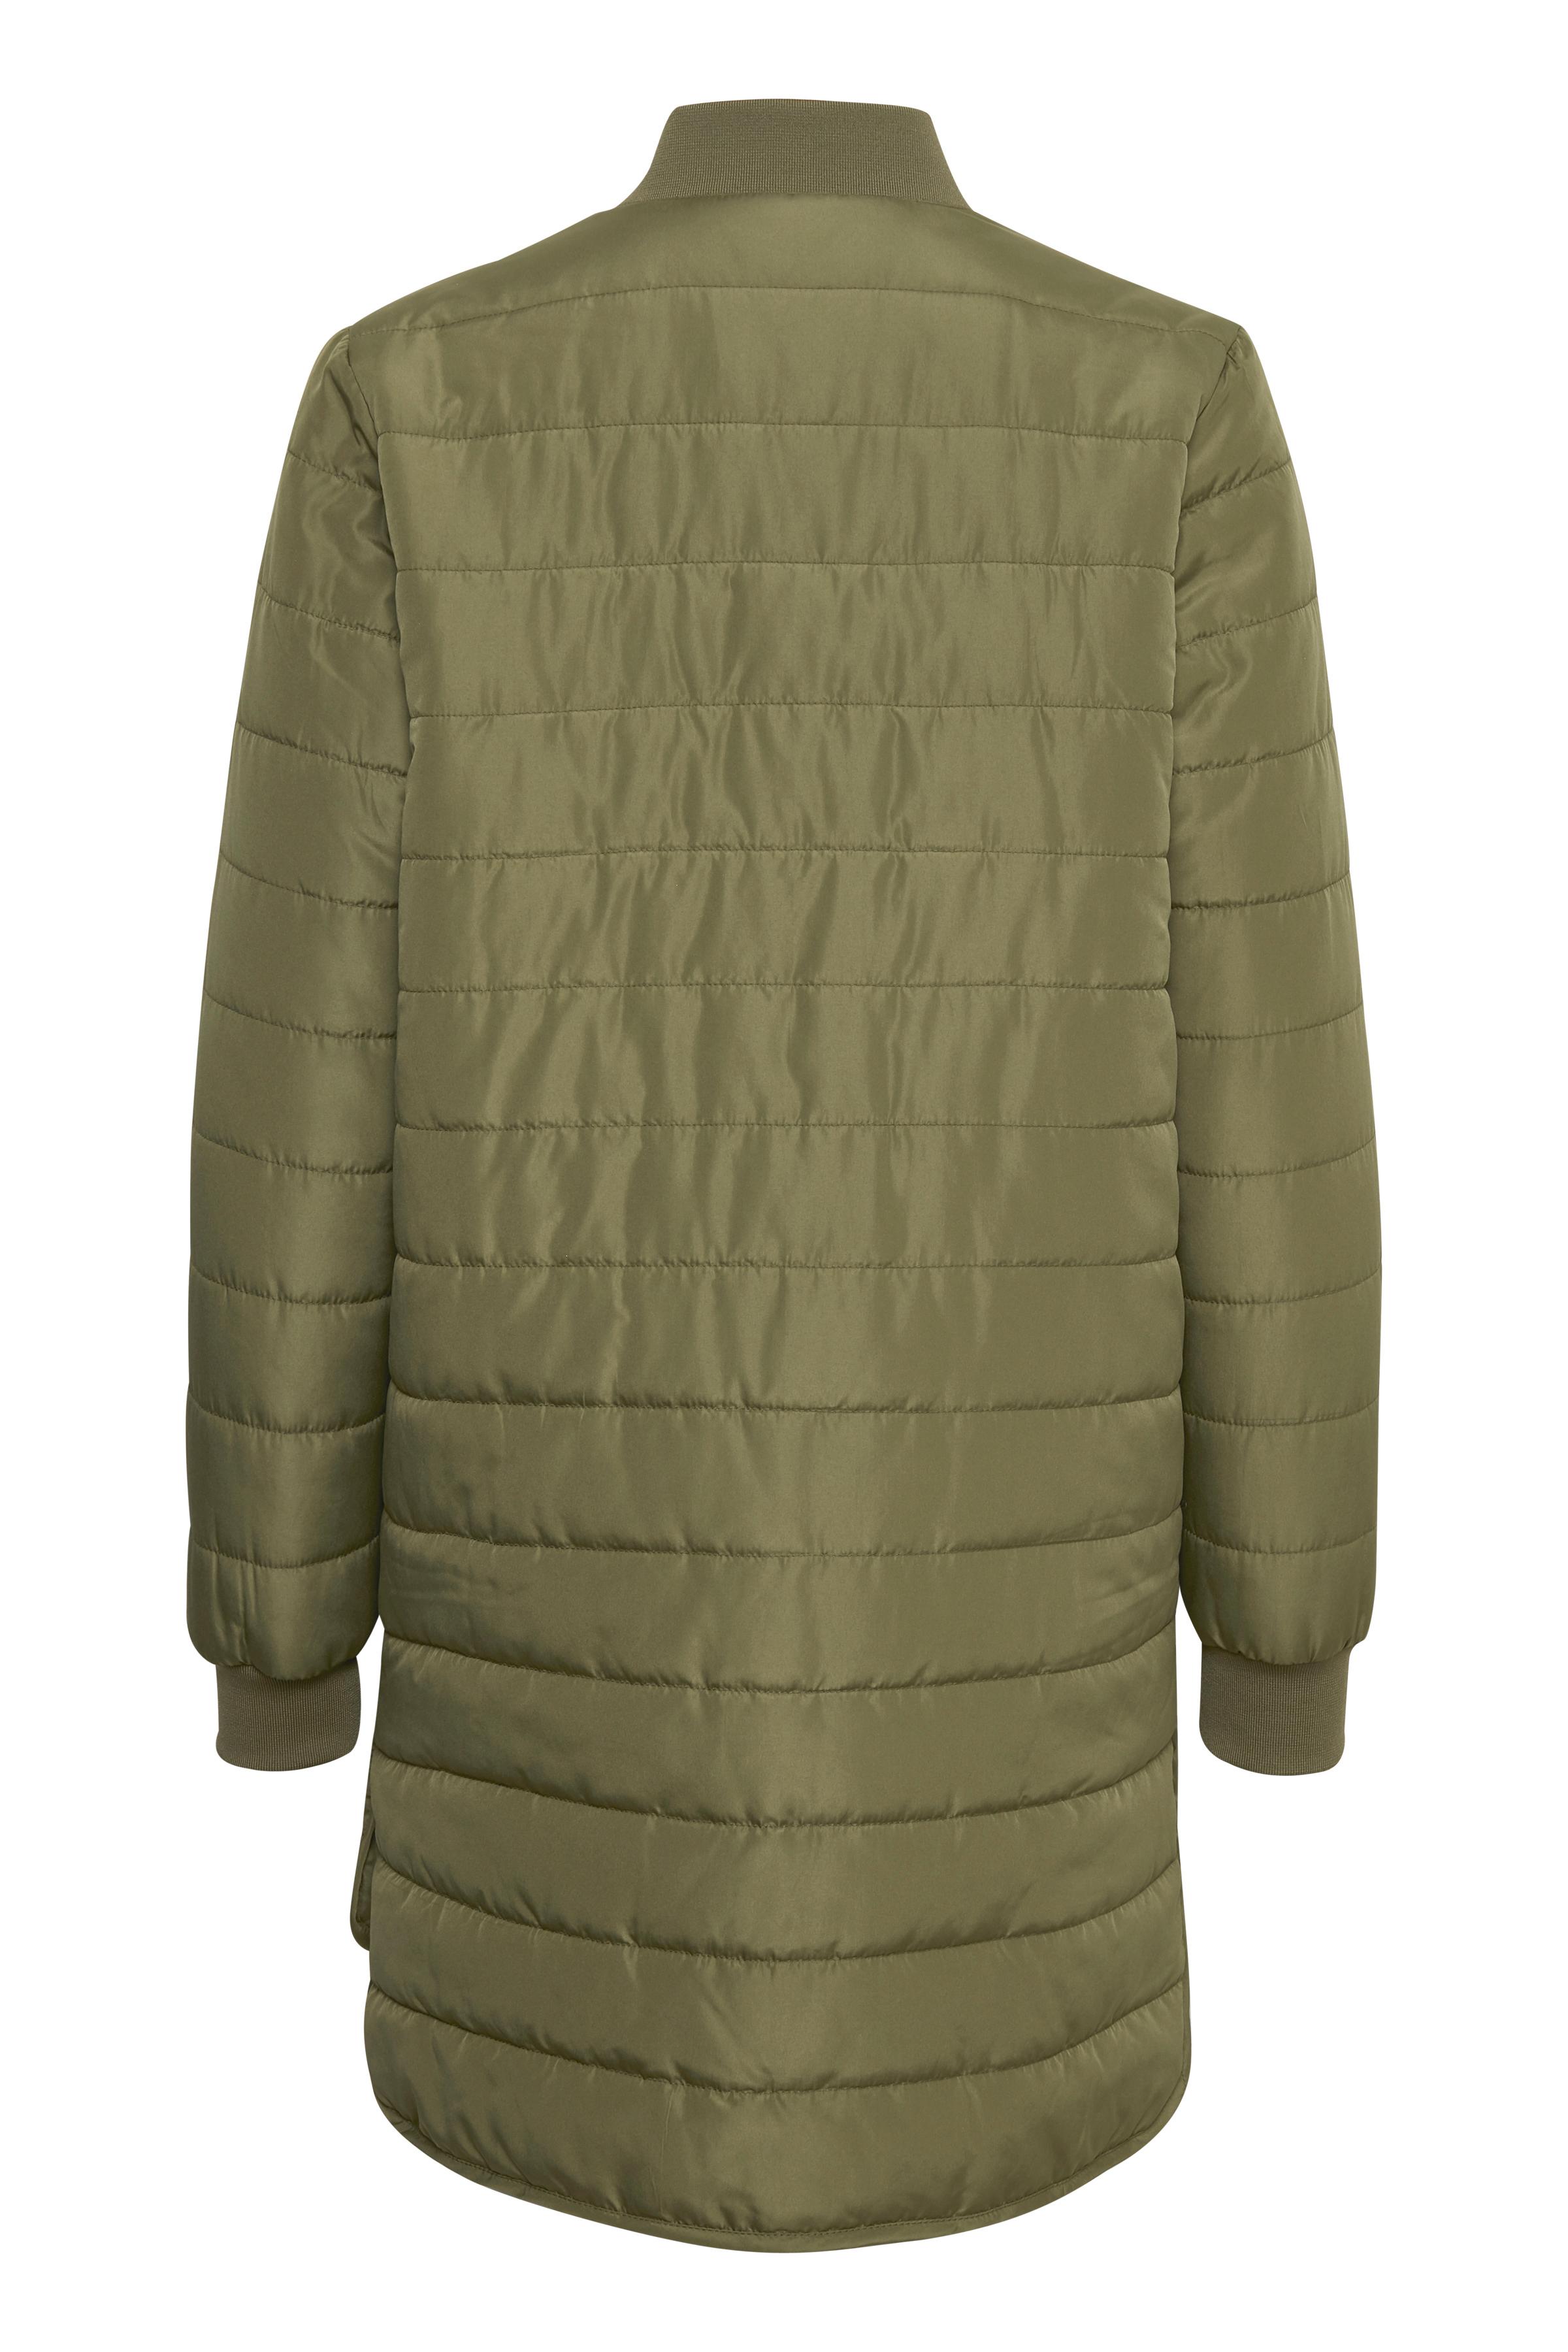 Dunkelgrün Mantel von Bon'A Parte – Shoppen Sie Dunkelgrün Mantel ab Gr. S-2XL hier